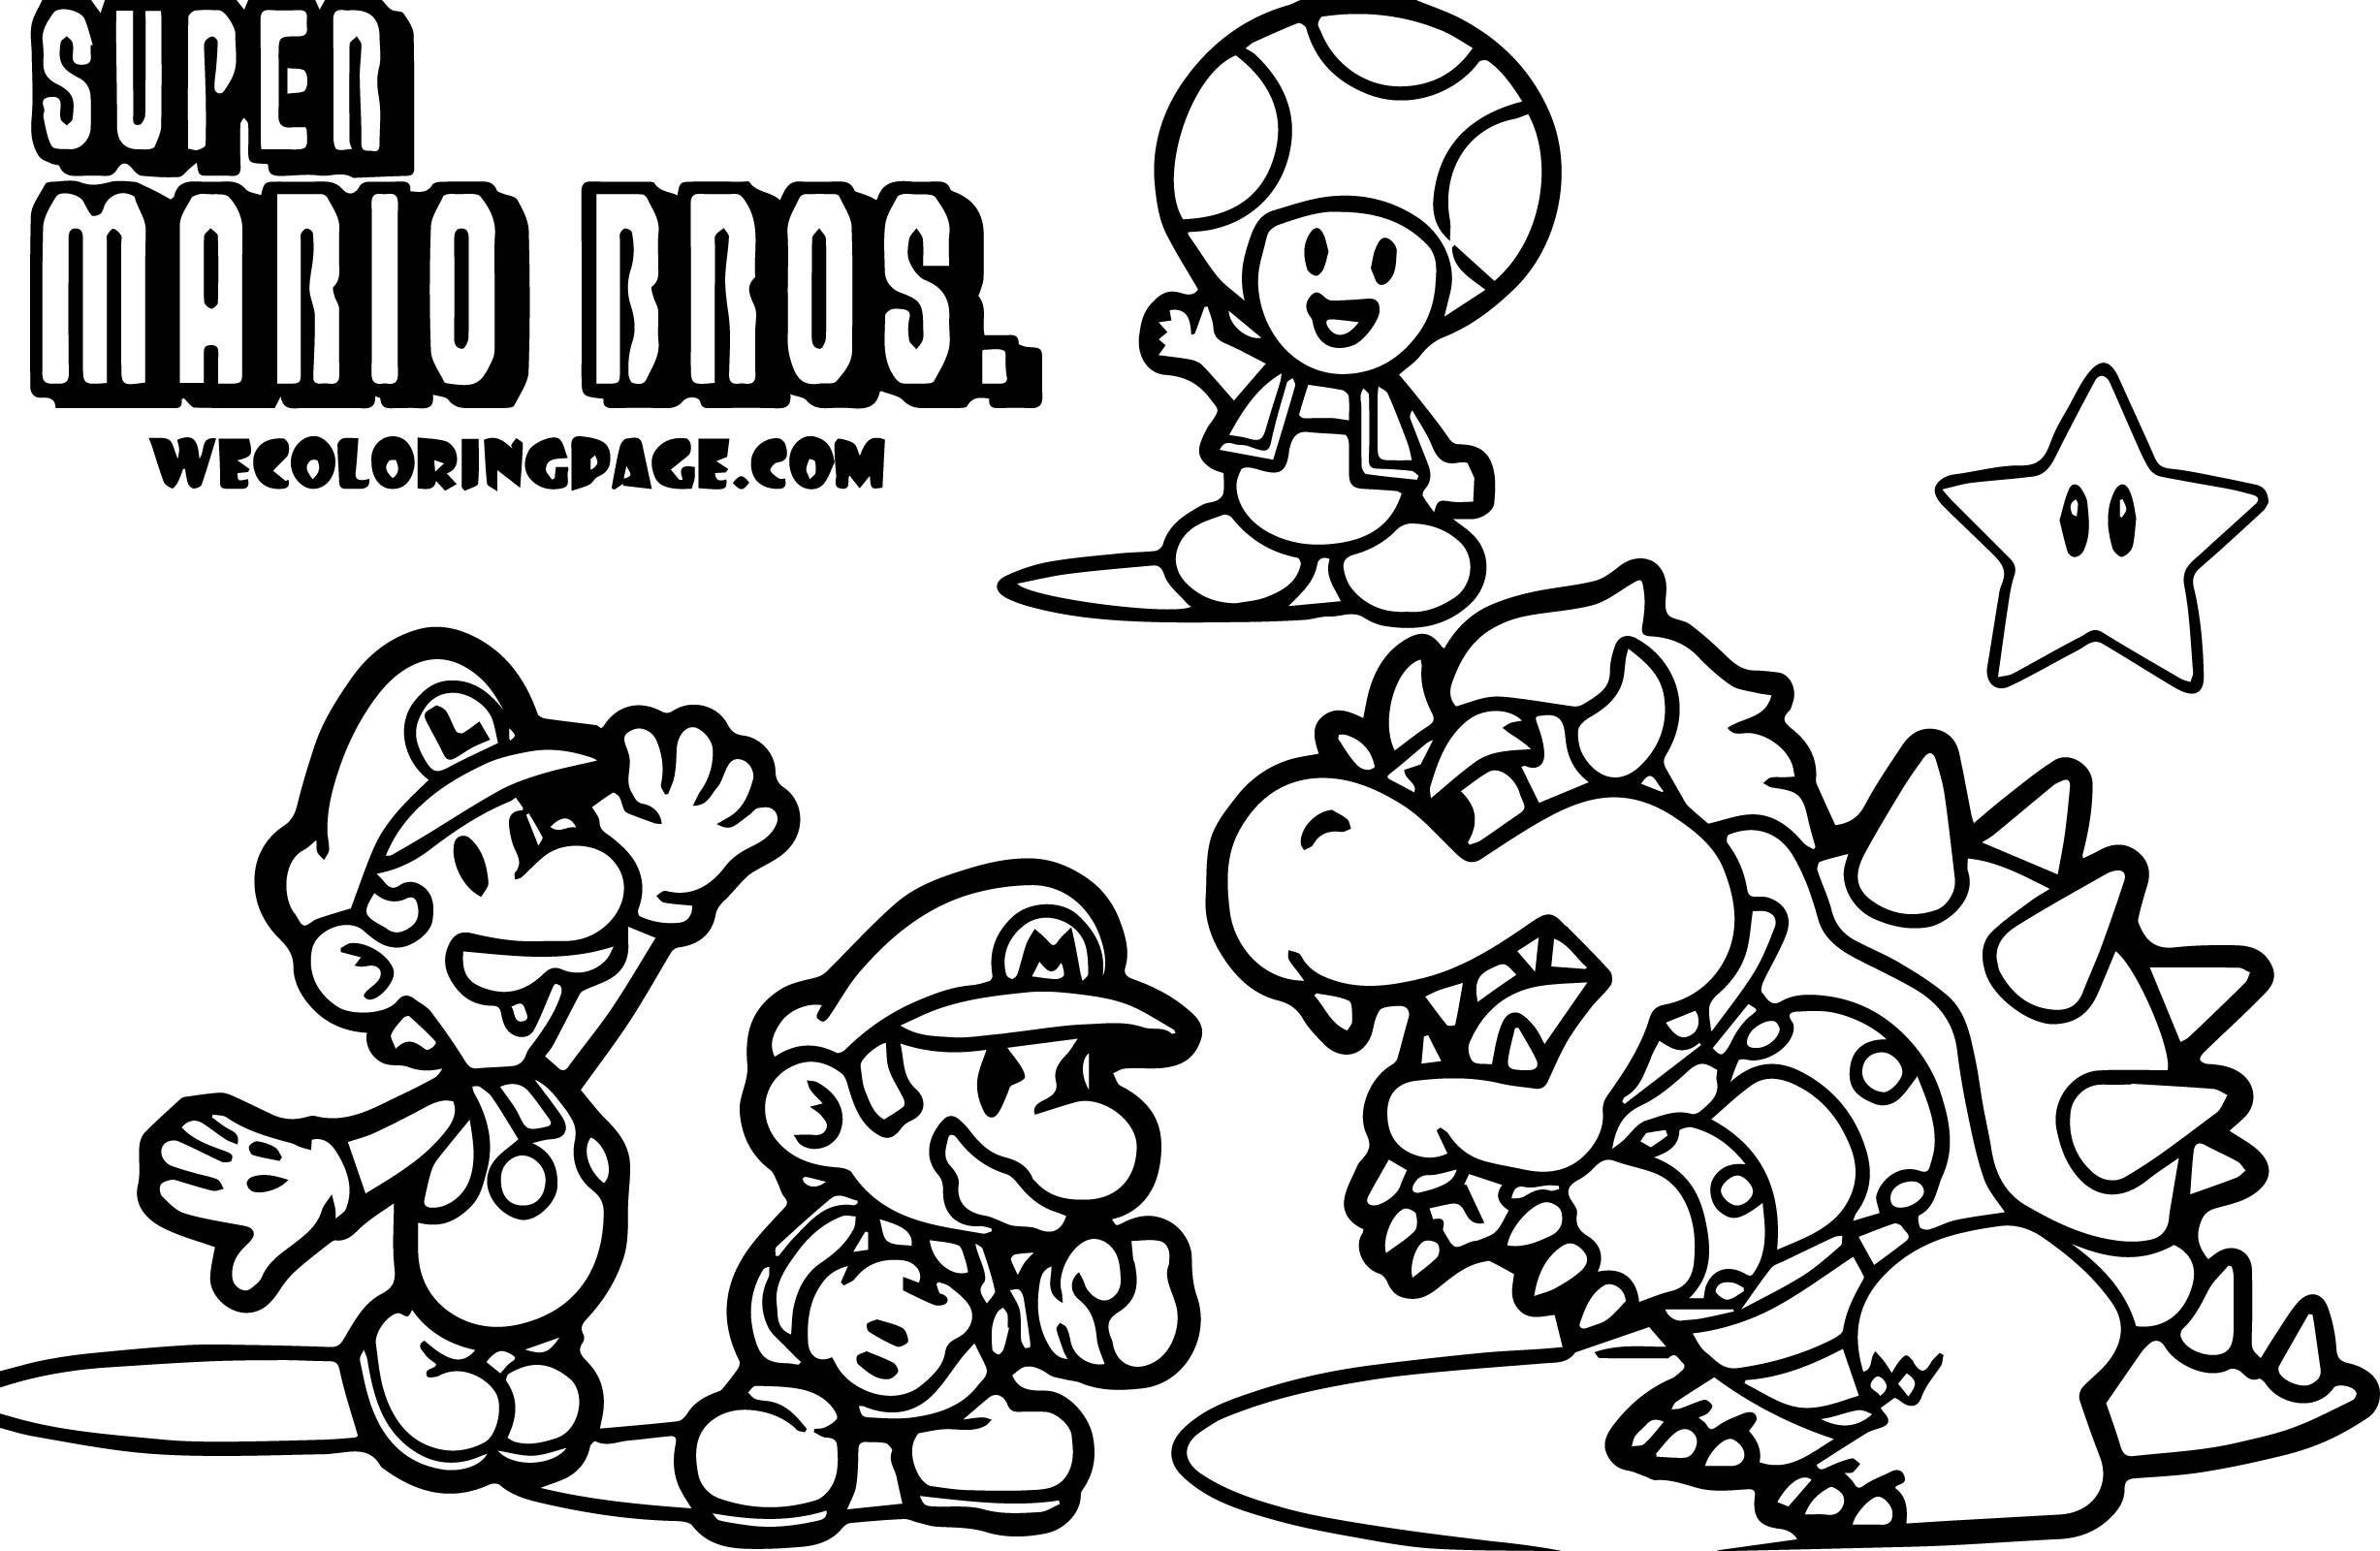 Super Mario Pilz Ausmalbilder Einzigartig 37 Super Mario Kart Ausmalbilder Scoredatscore Inspirierend Super Galerie